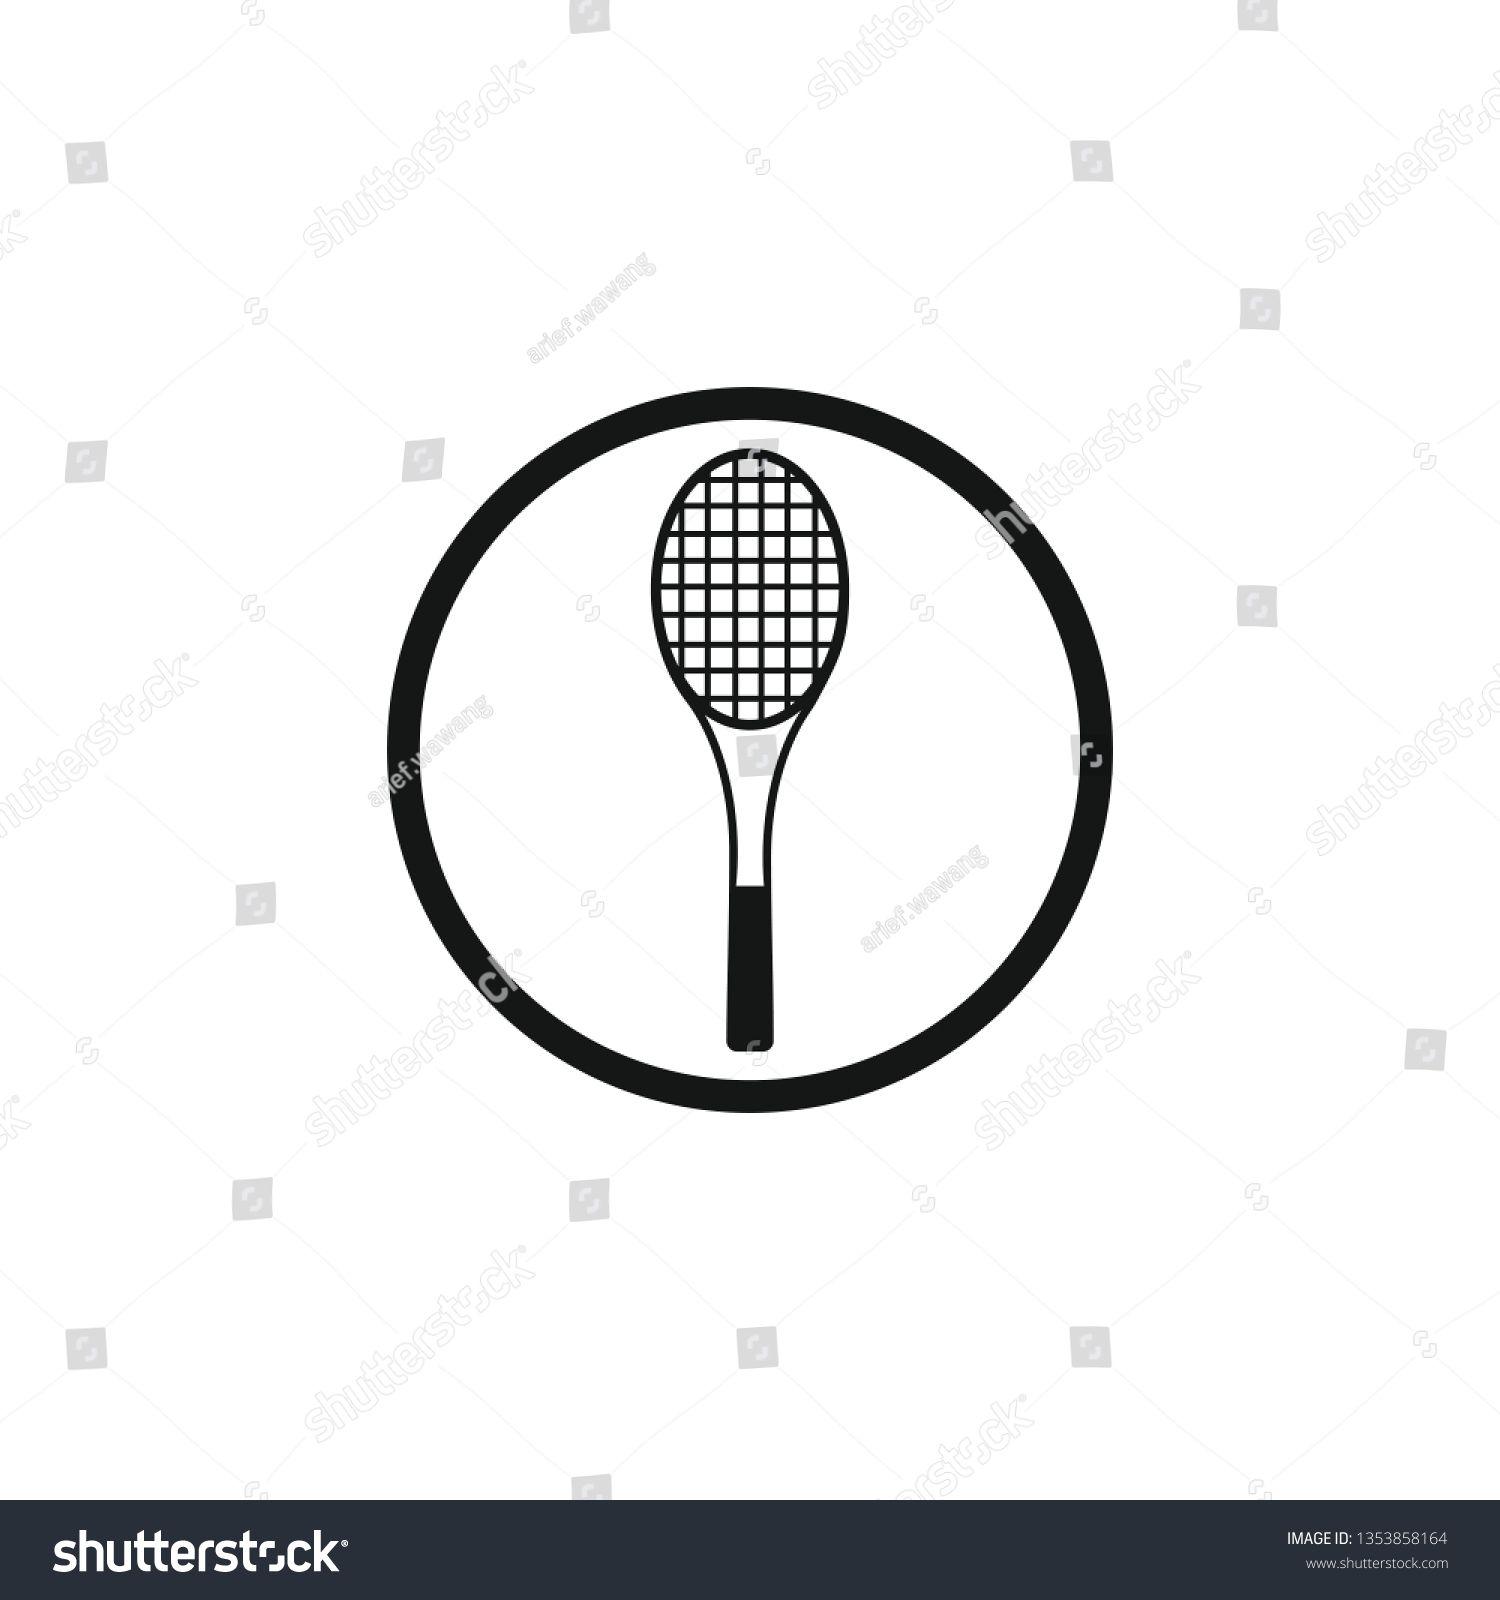 Racket Tennis Icon Symbol Ad Affiliate Tennis Racket Symbol Icon Art Drawings Tennis Australia Tennis Tennis Racket